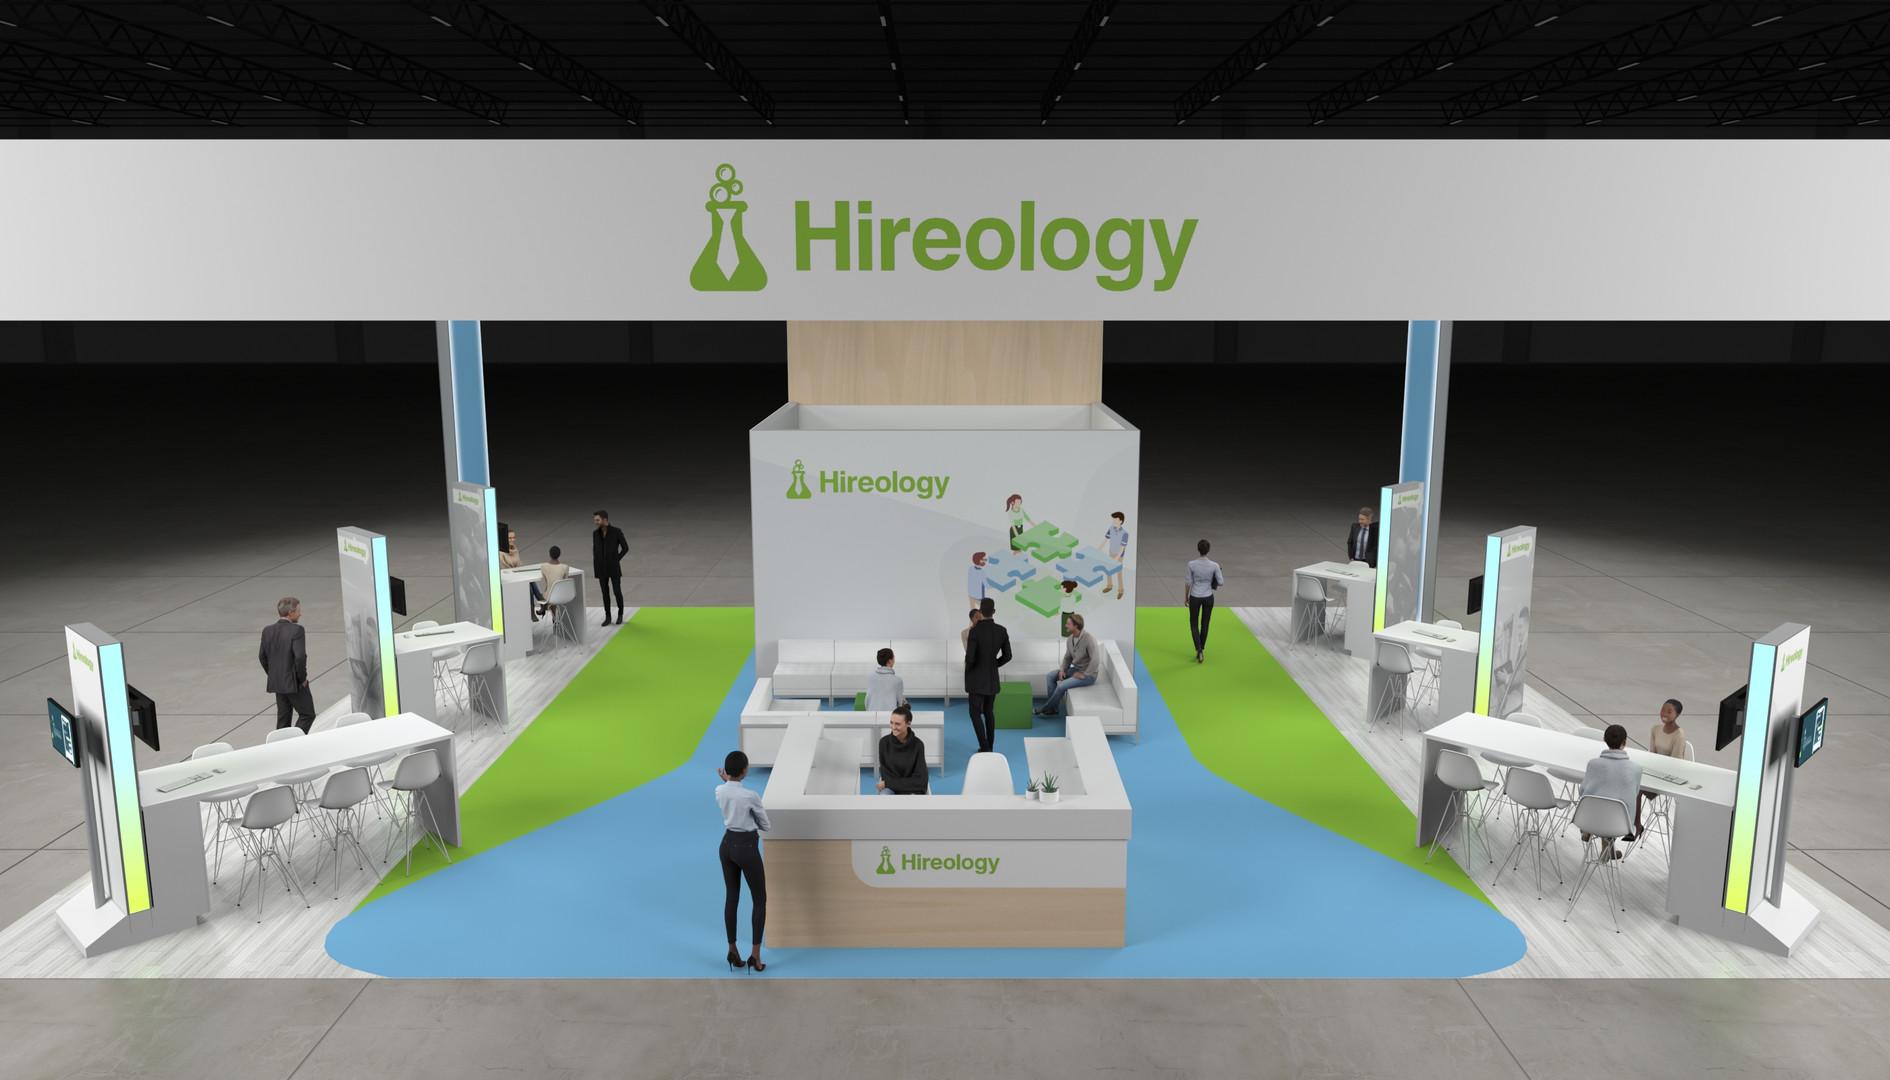 Hierology-2019-NADA-OPT3_carpet.jpg